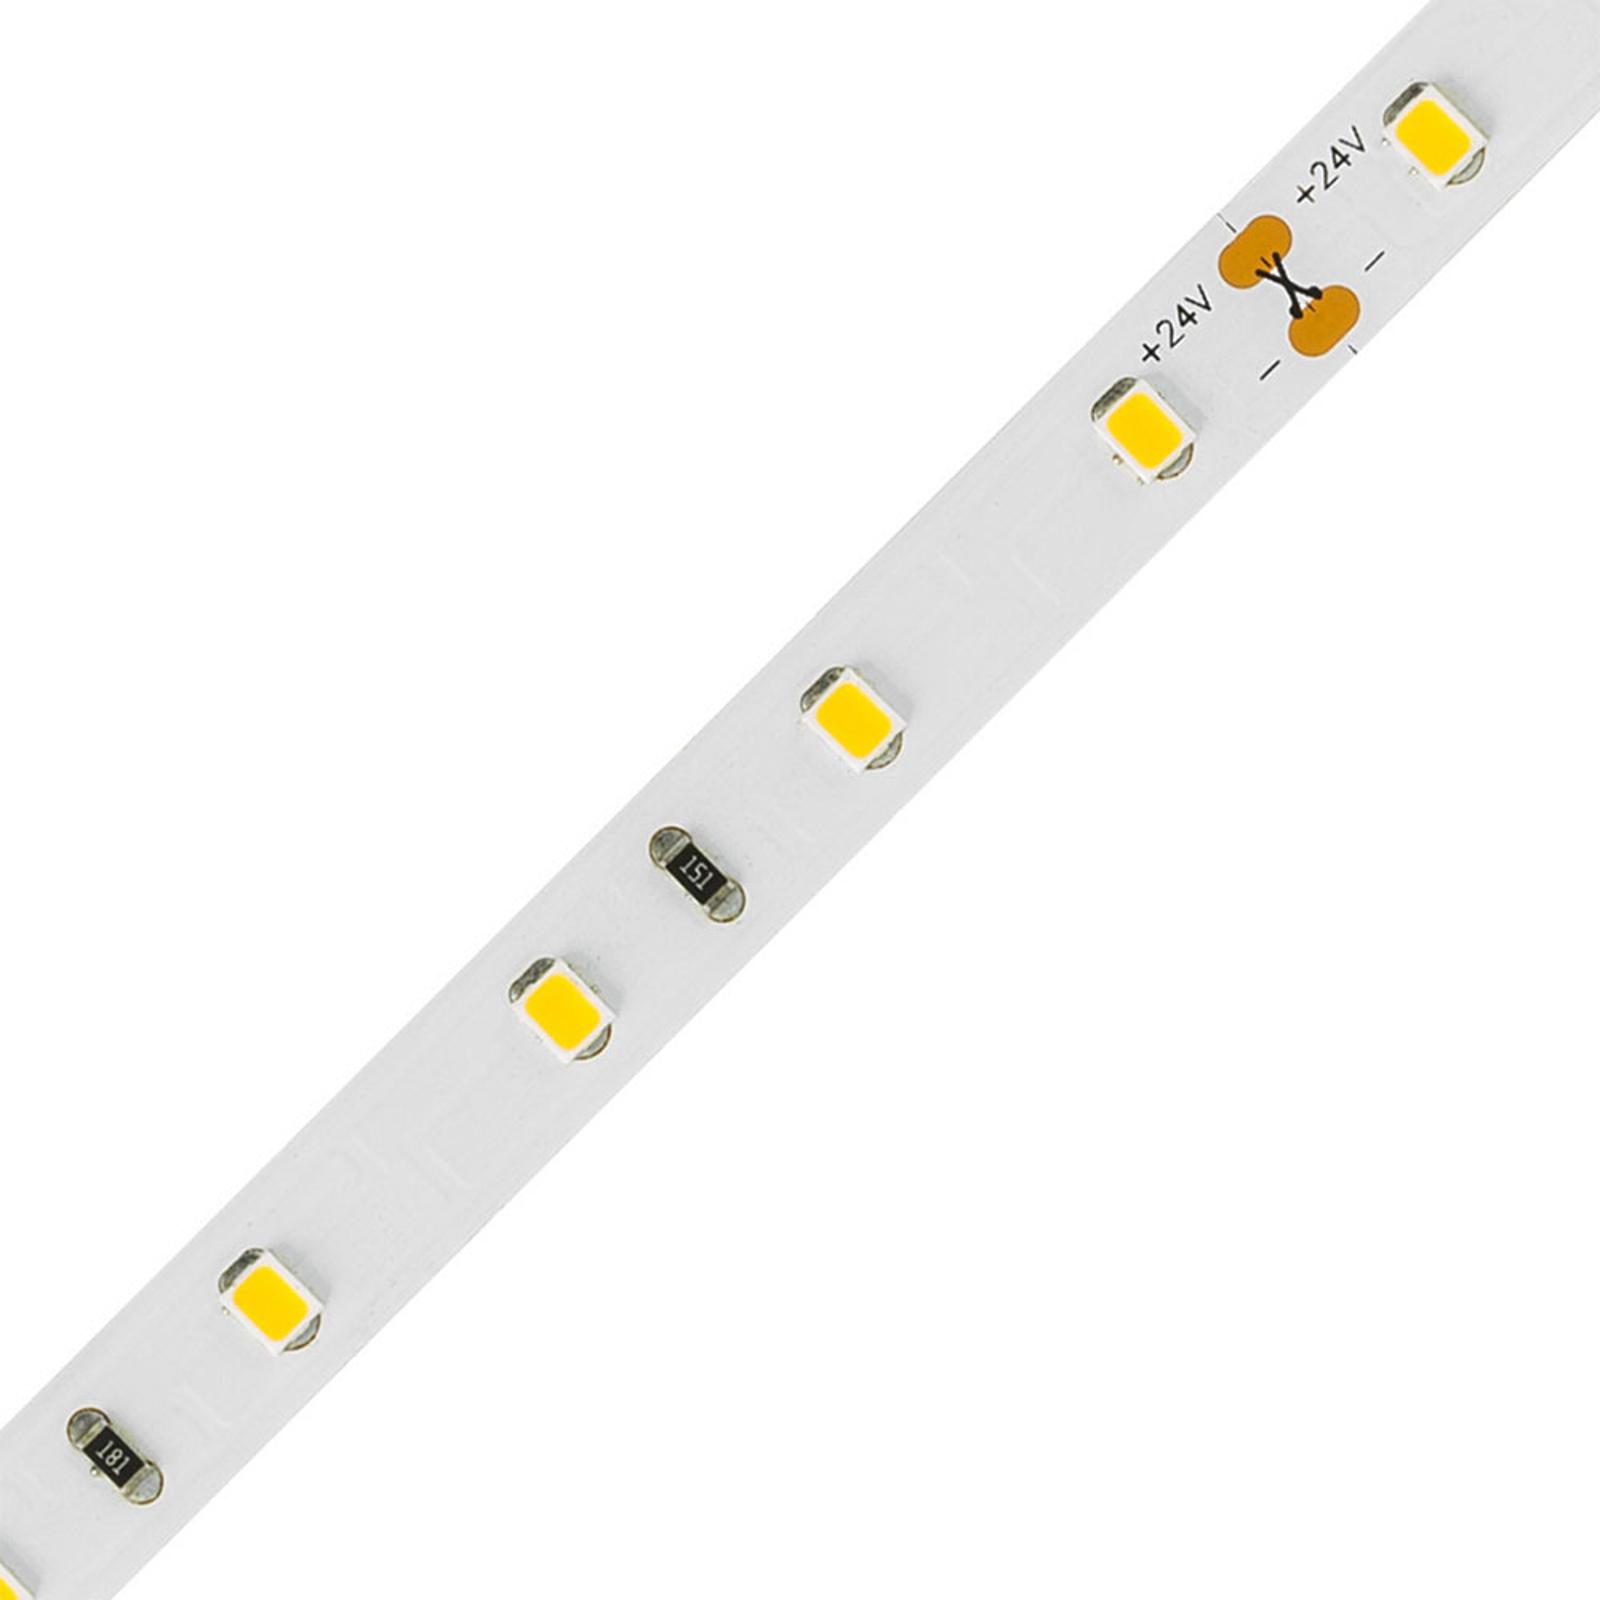 EVN STR2024 LED-list IP20 5 m 24 W 3000K